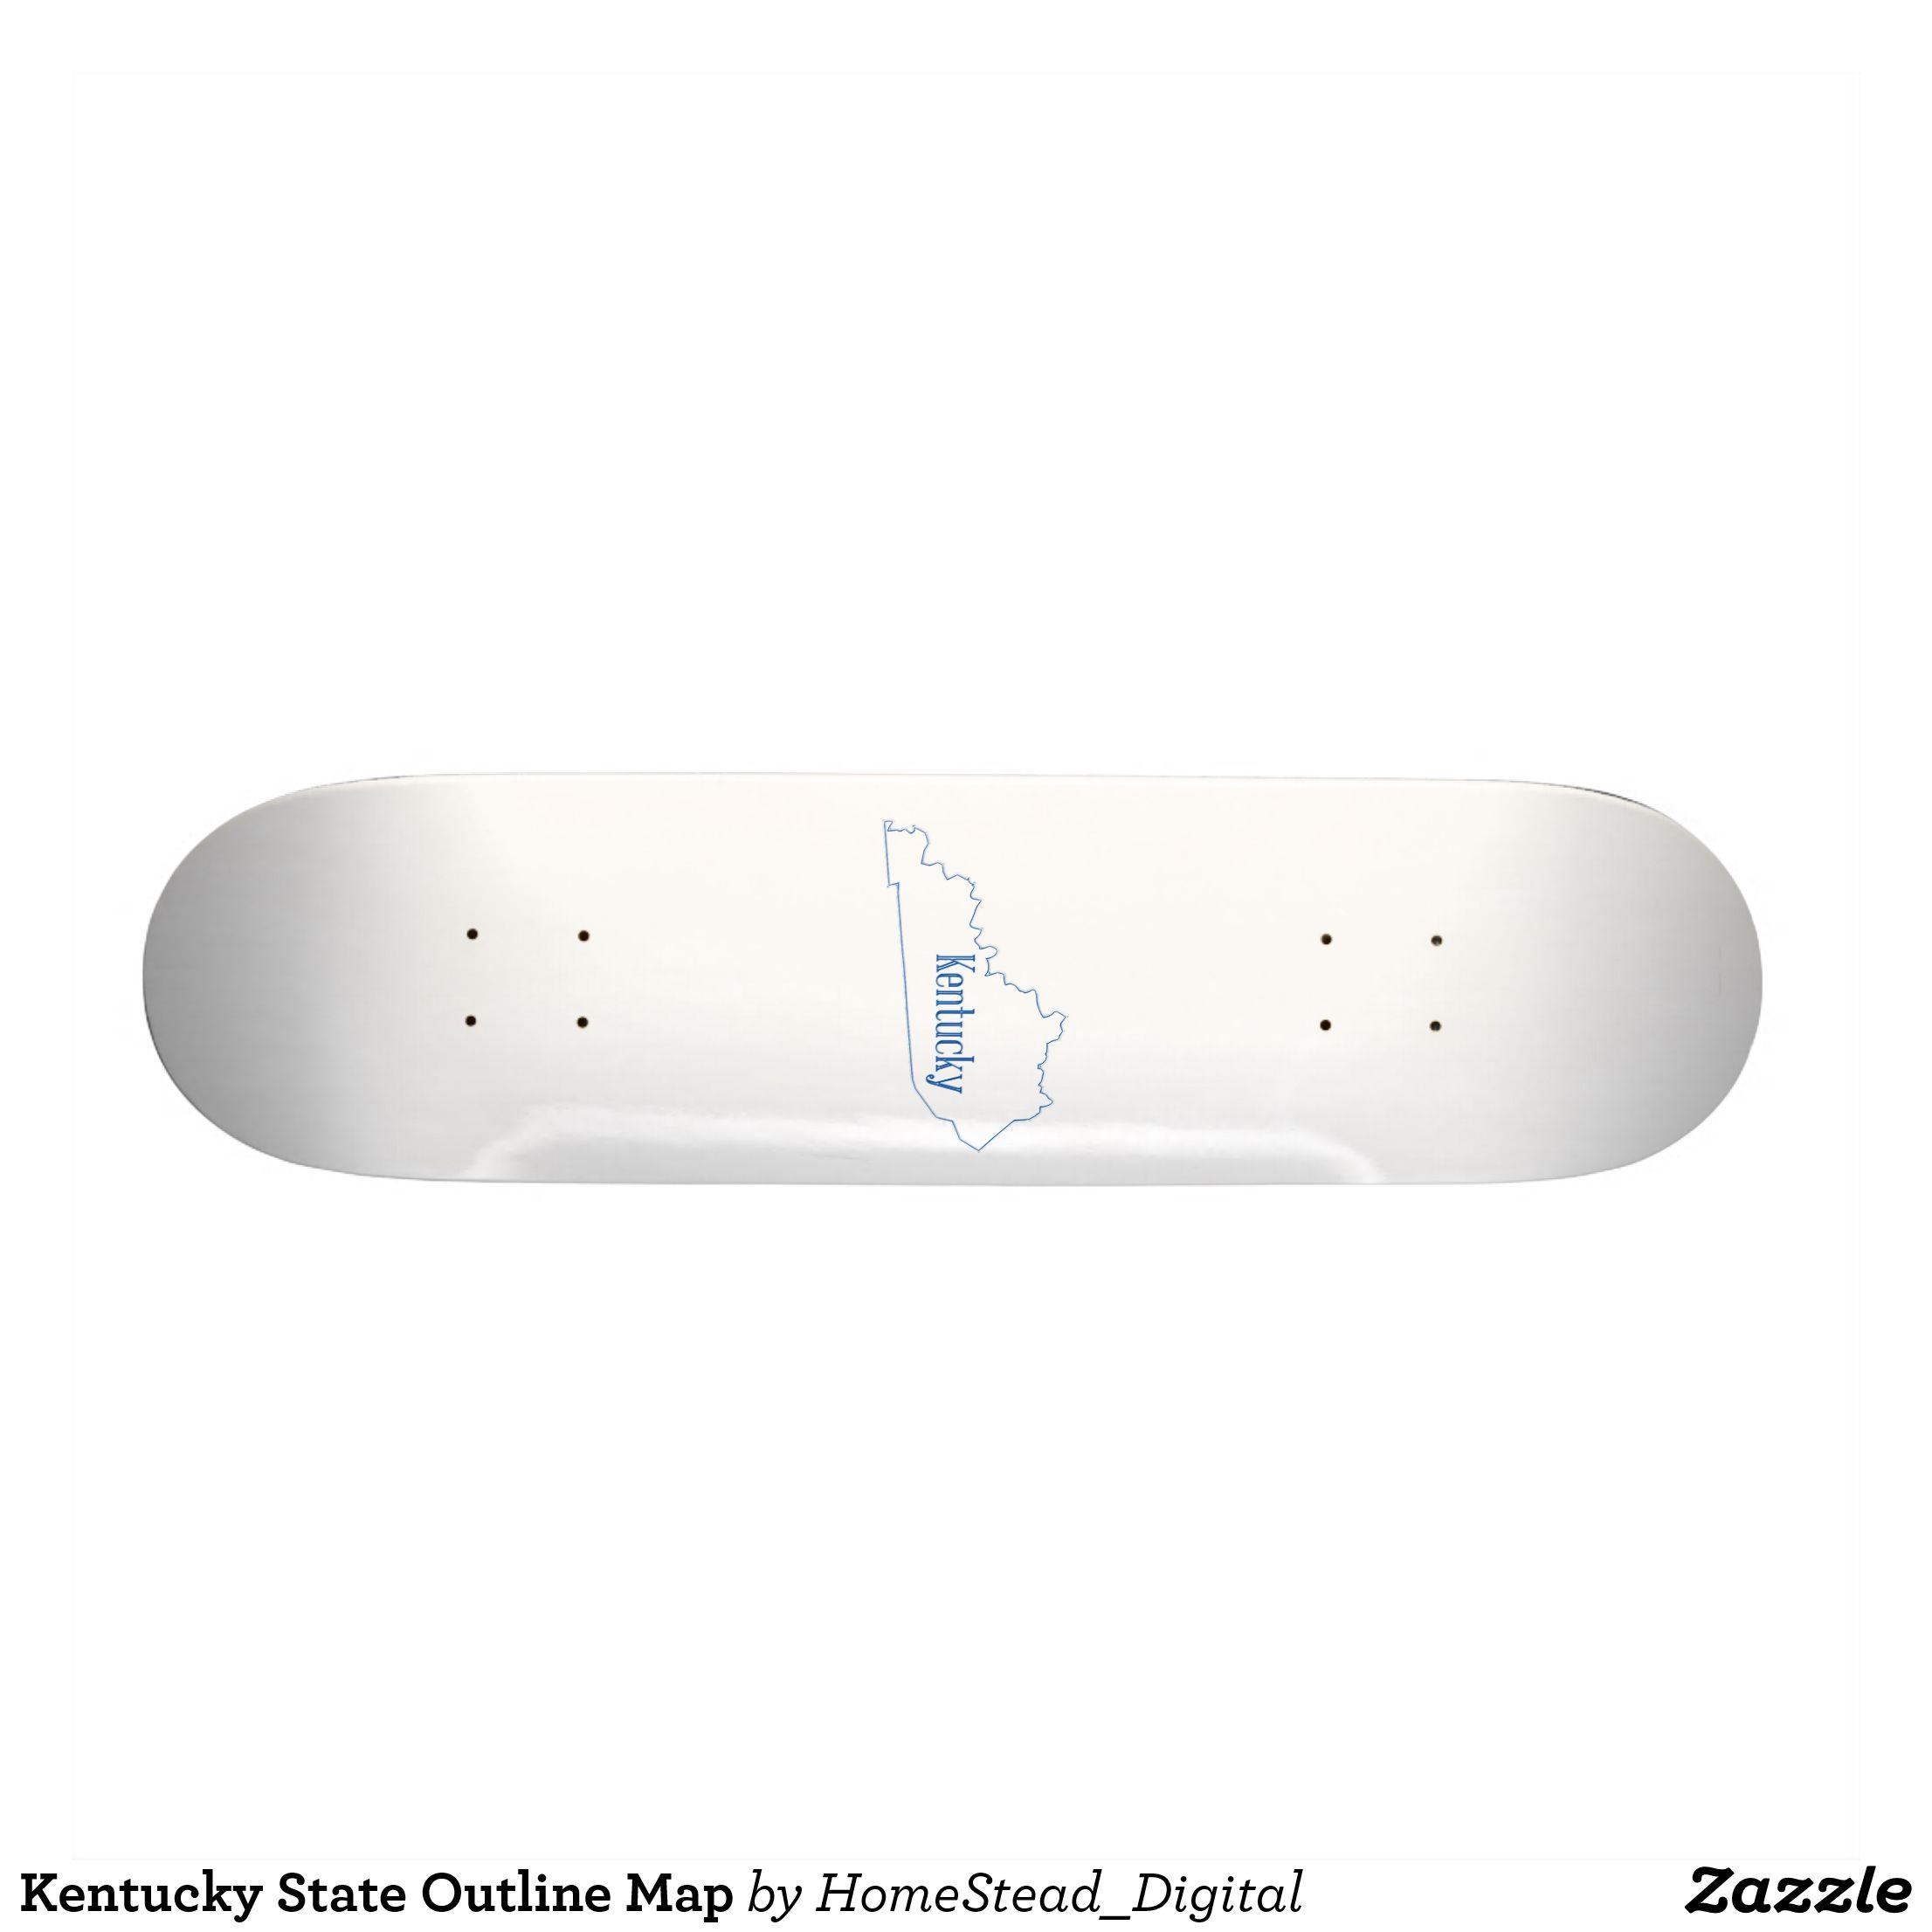 Kentucky State Outline Map Skateboard Zazzle Com